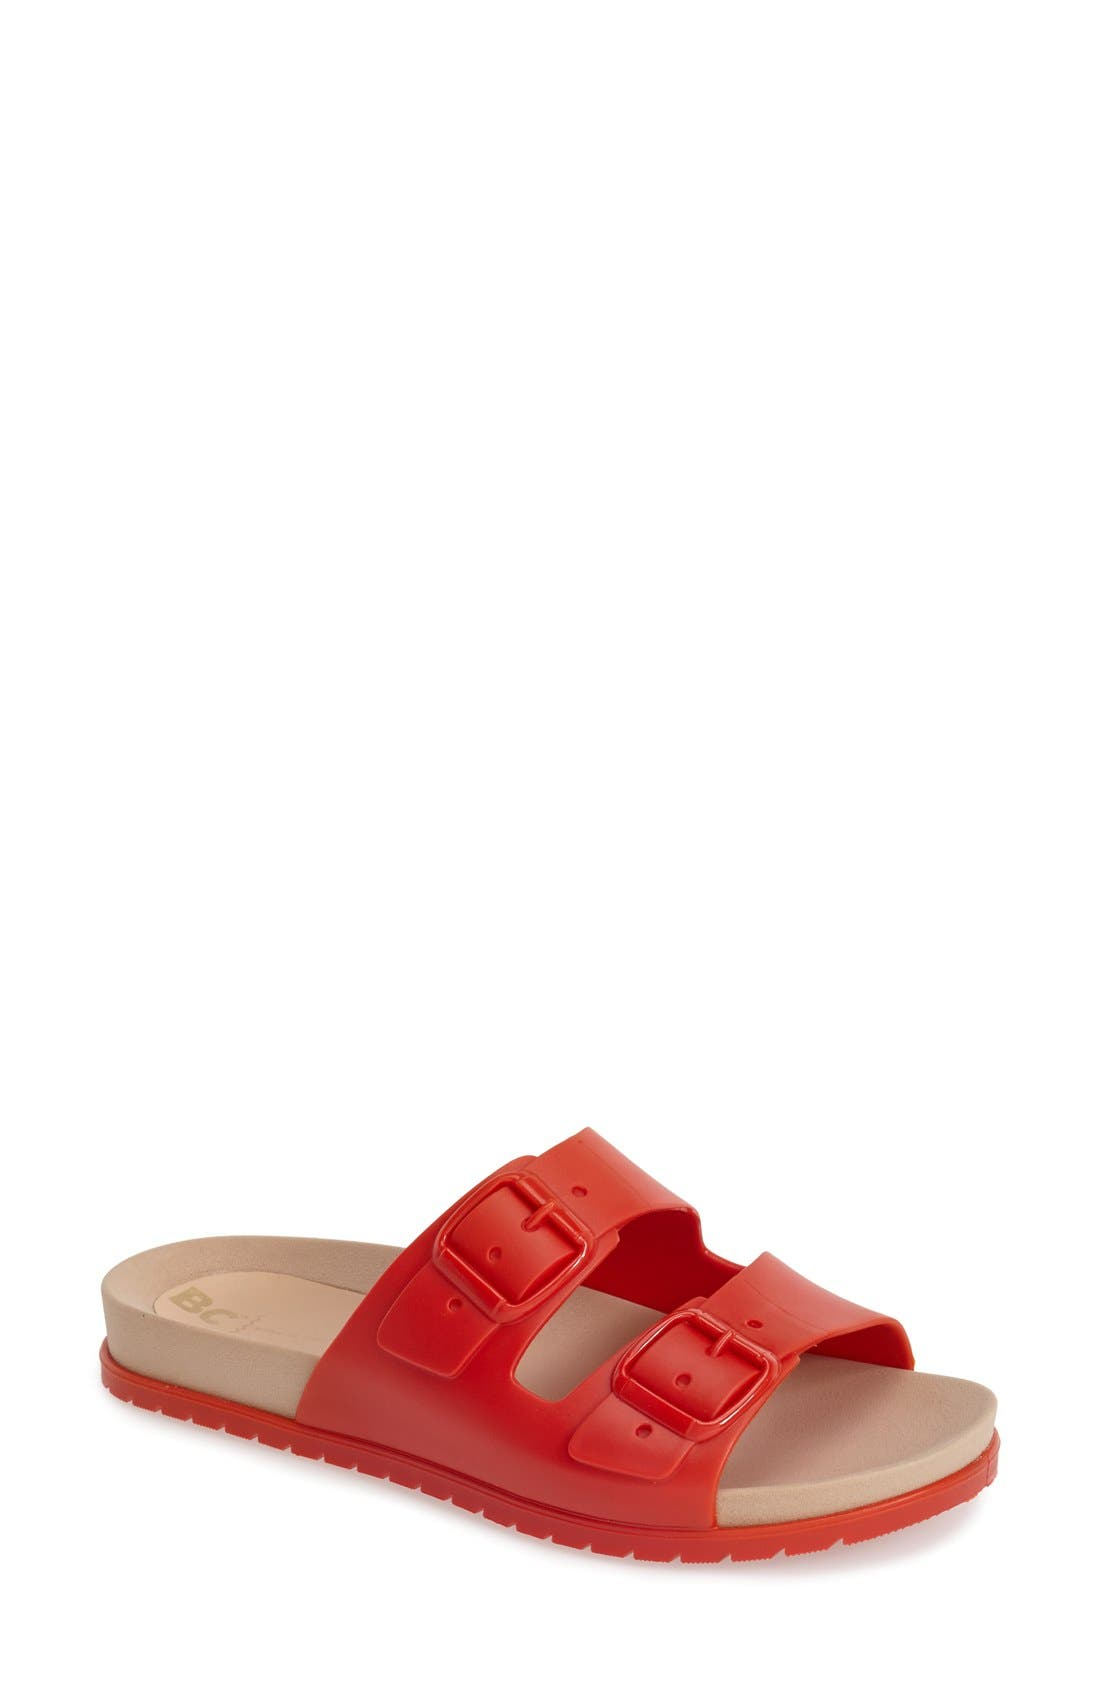 Alternate Image 1 Selected - BC Footwear 'Dim The Lights' Slide Sandal (Women)